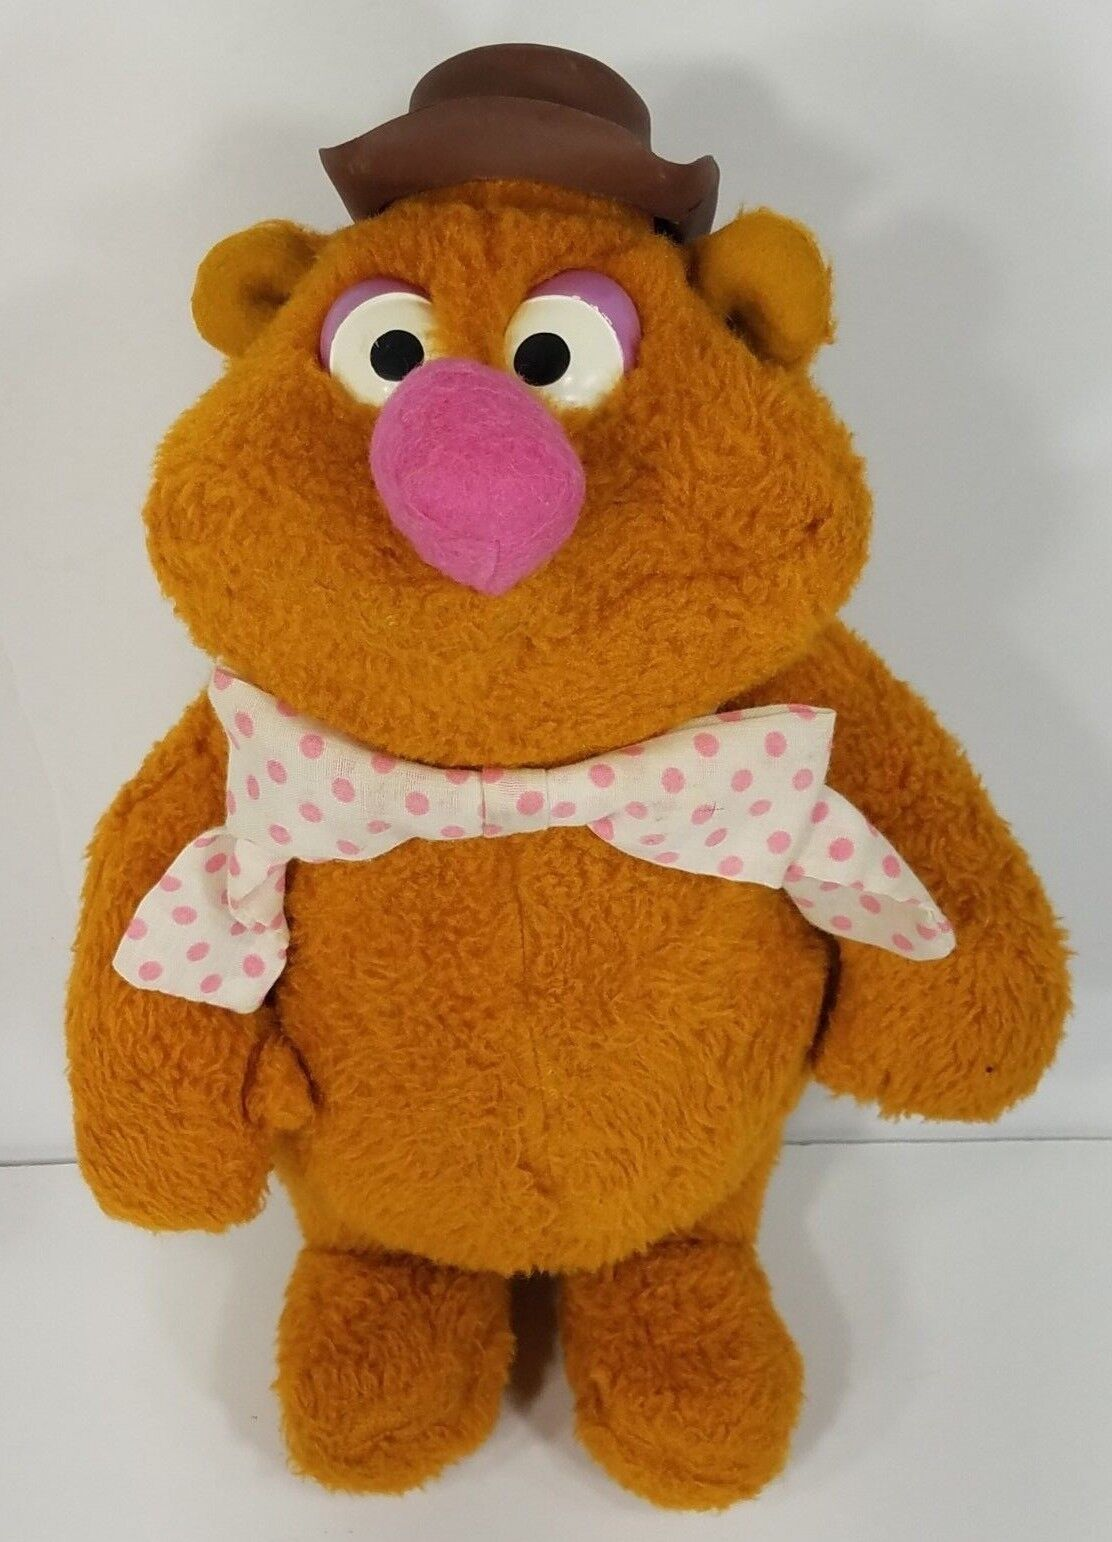 RARE Jim Henson & Associates Fozzie Doll 13 in stuffed plush Fisher-Price 1976